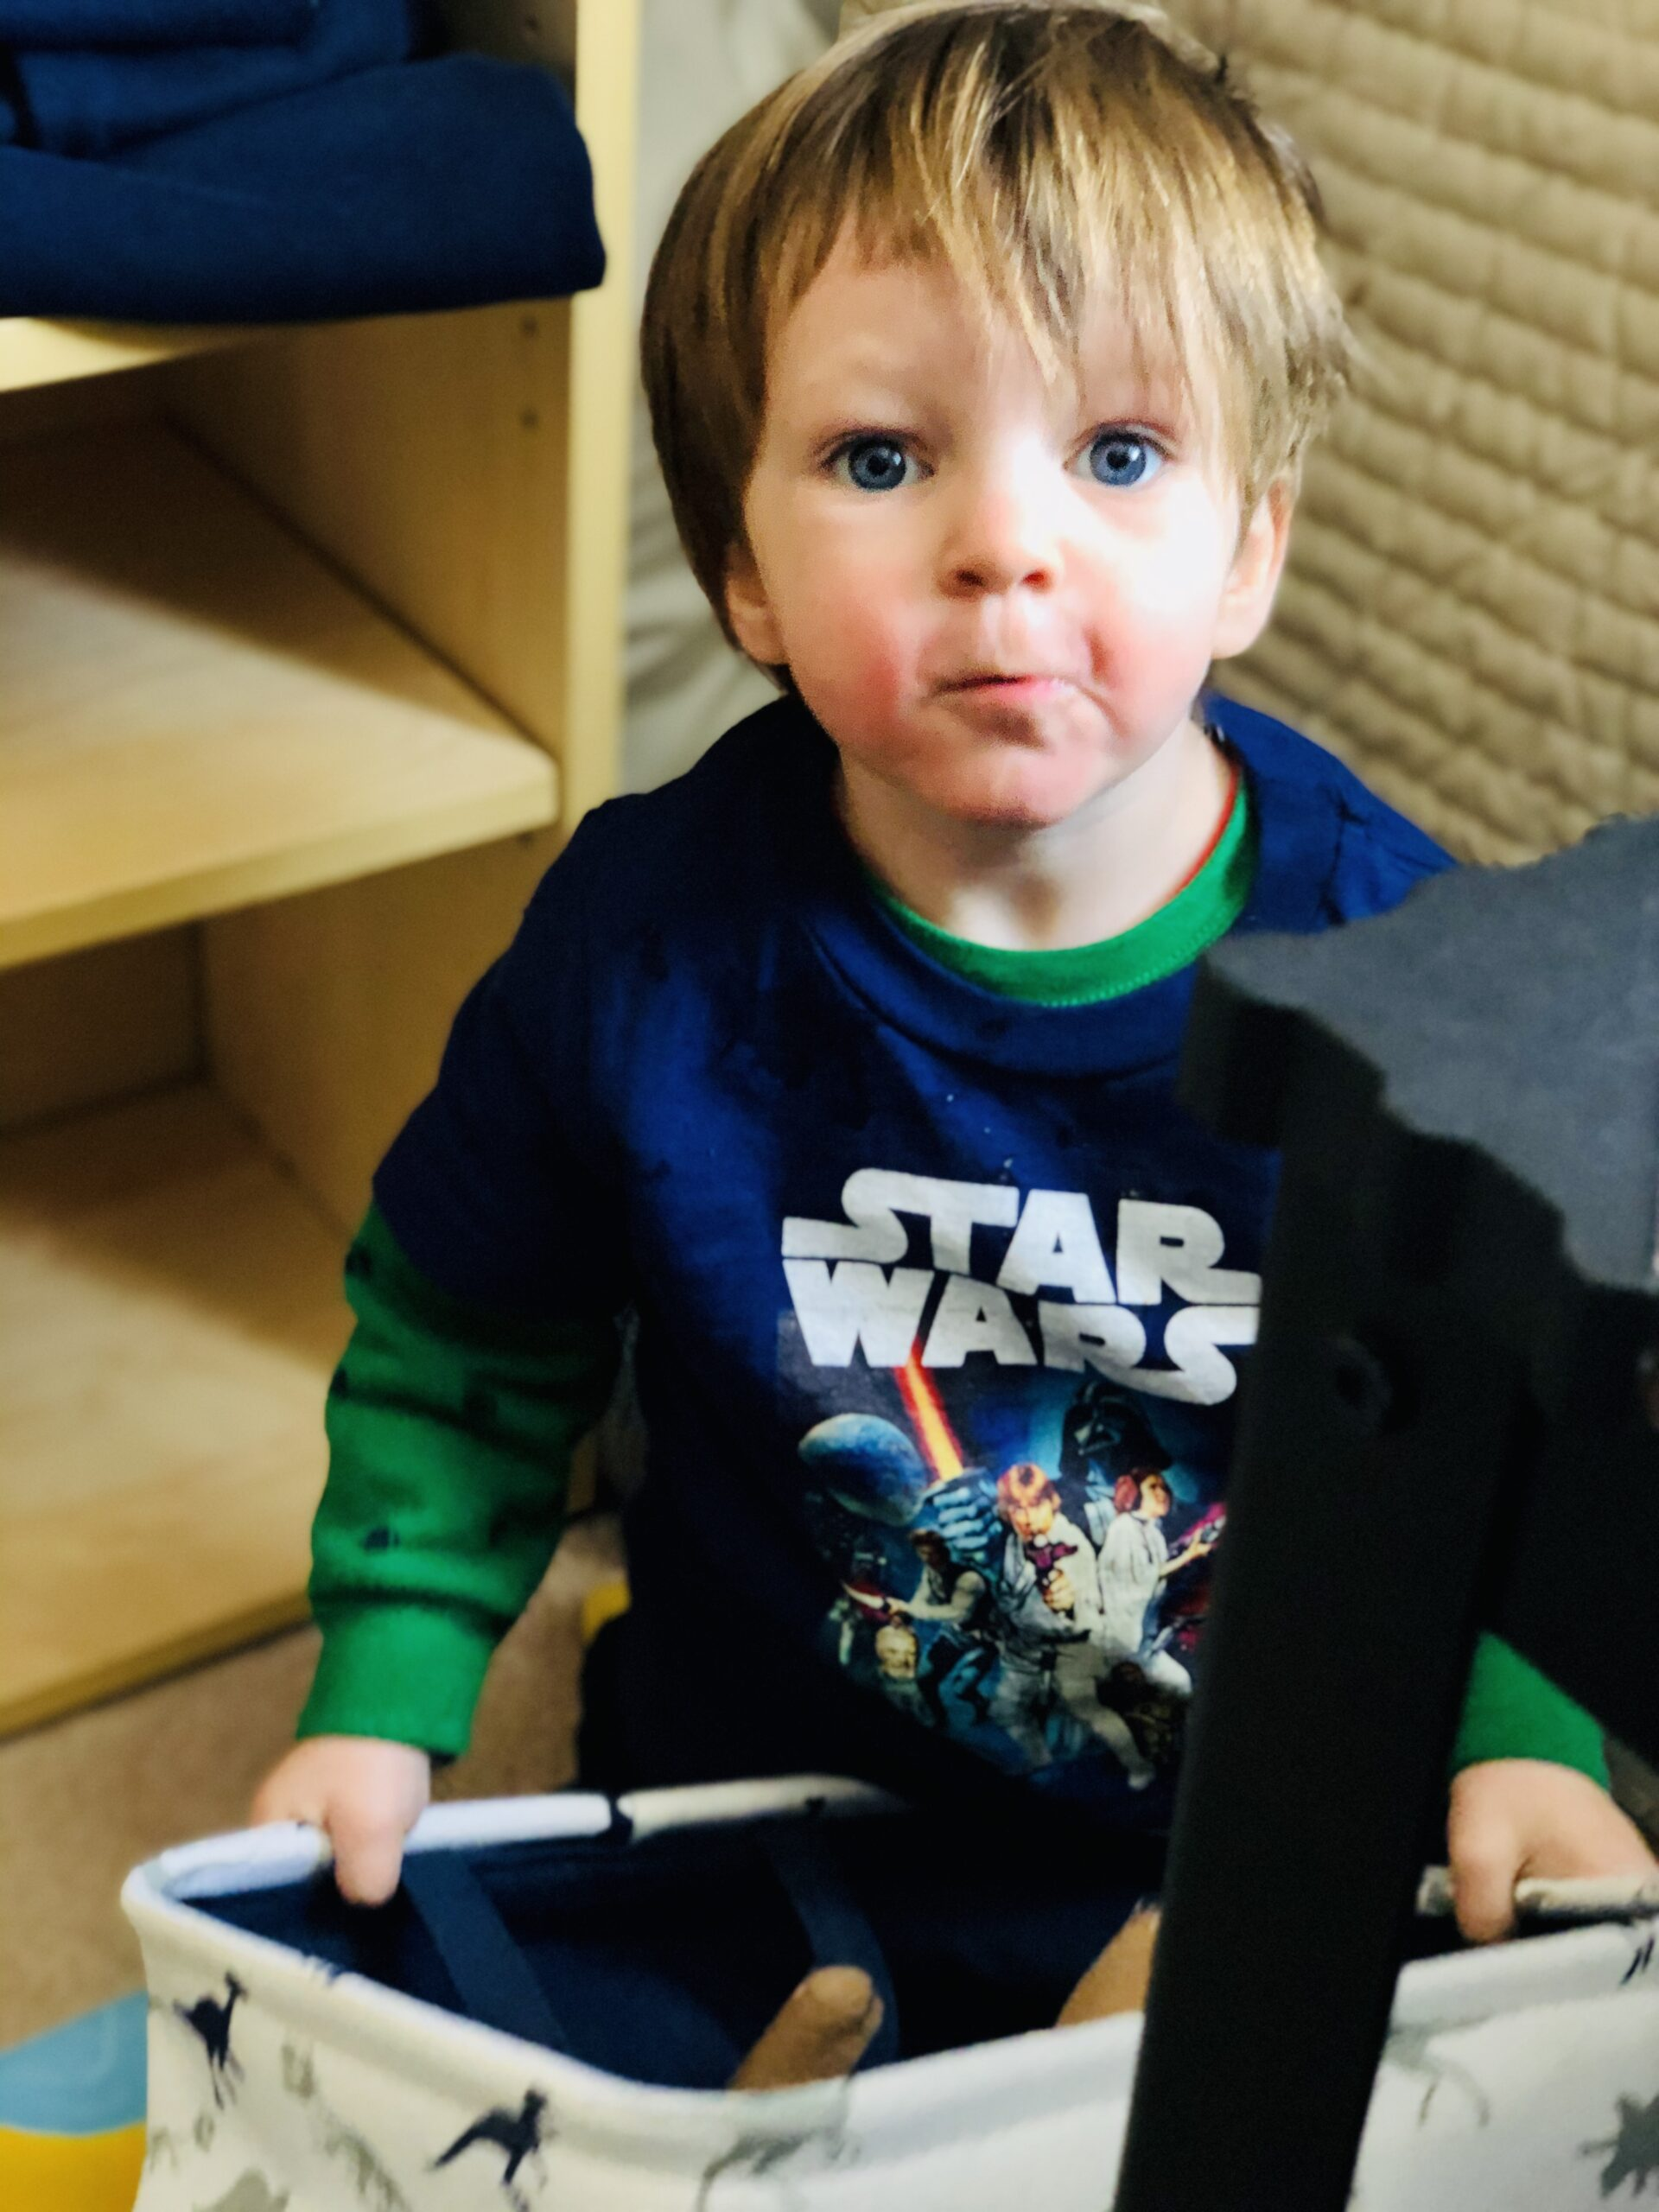 A young boy wearing a Star Wars shirt.